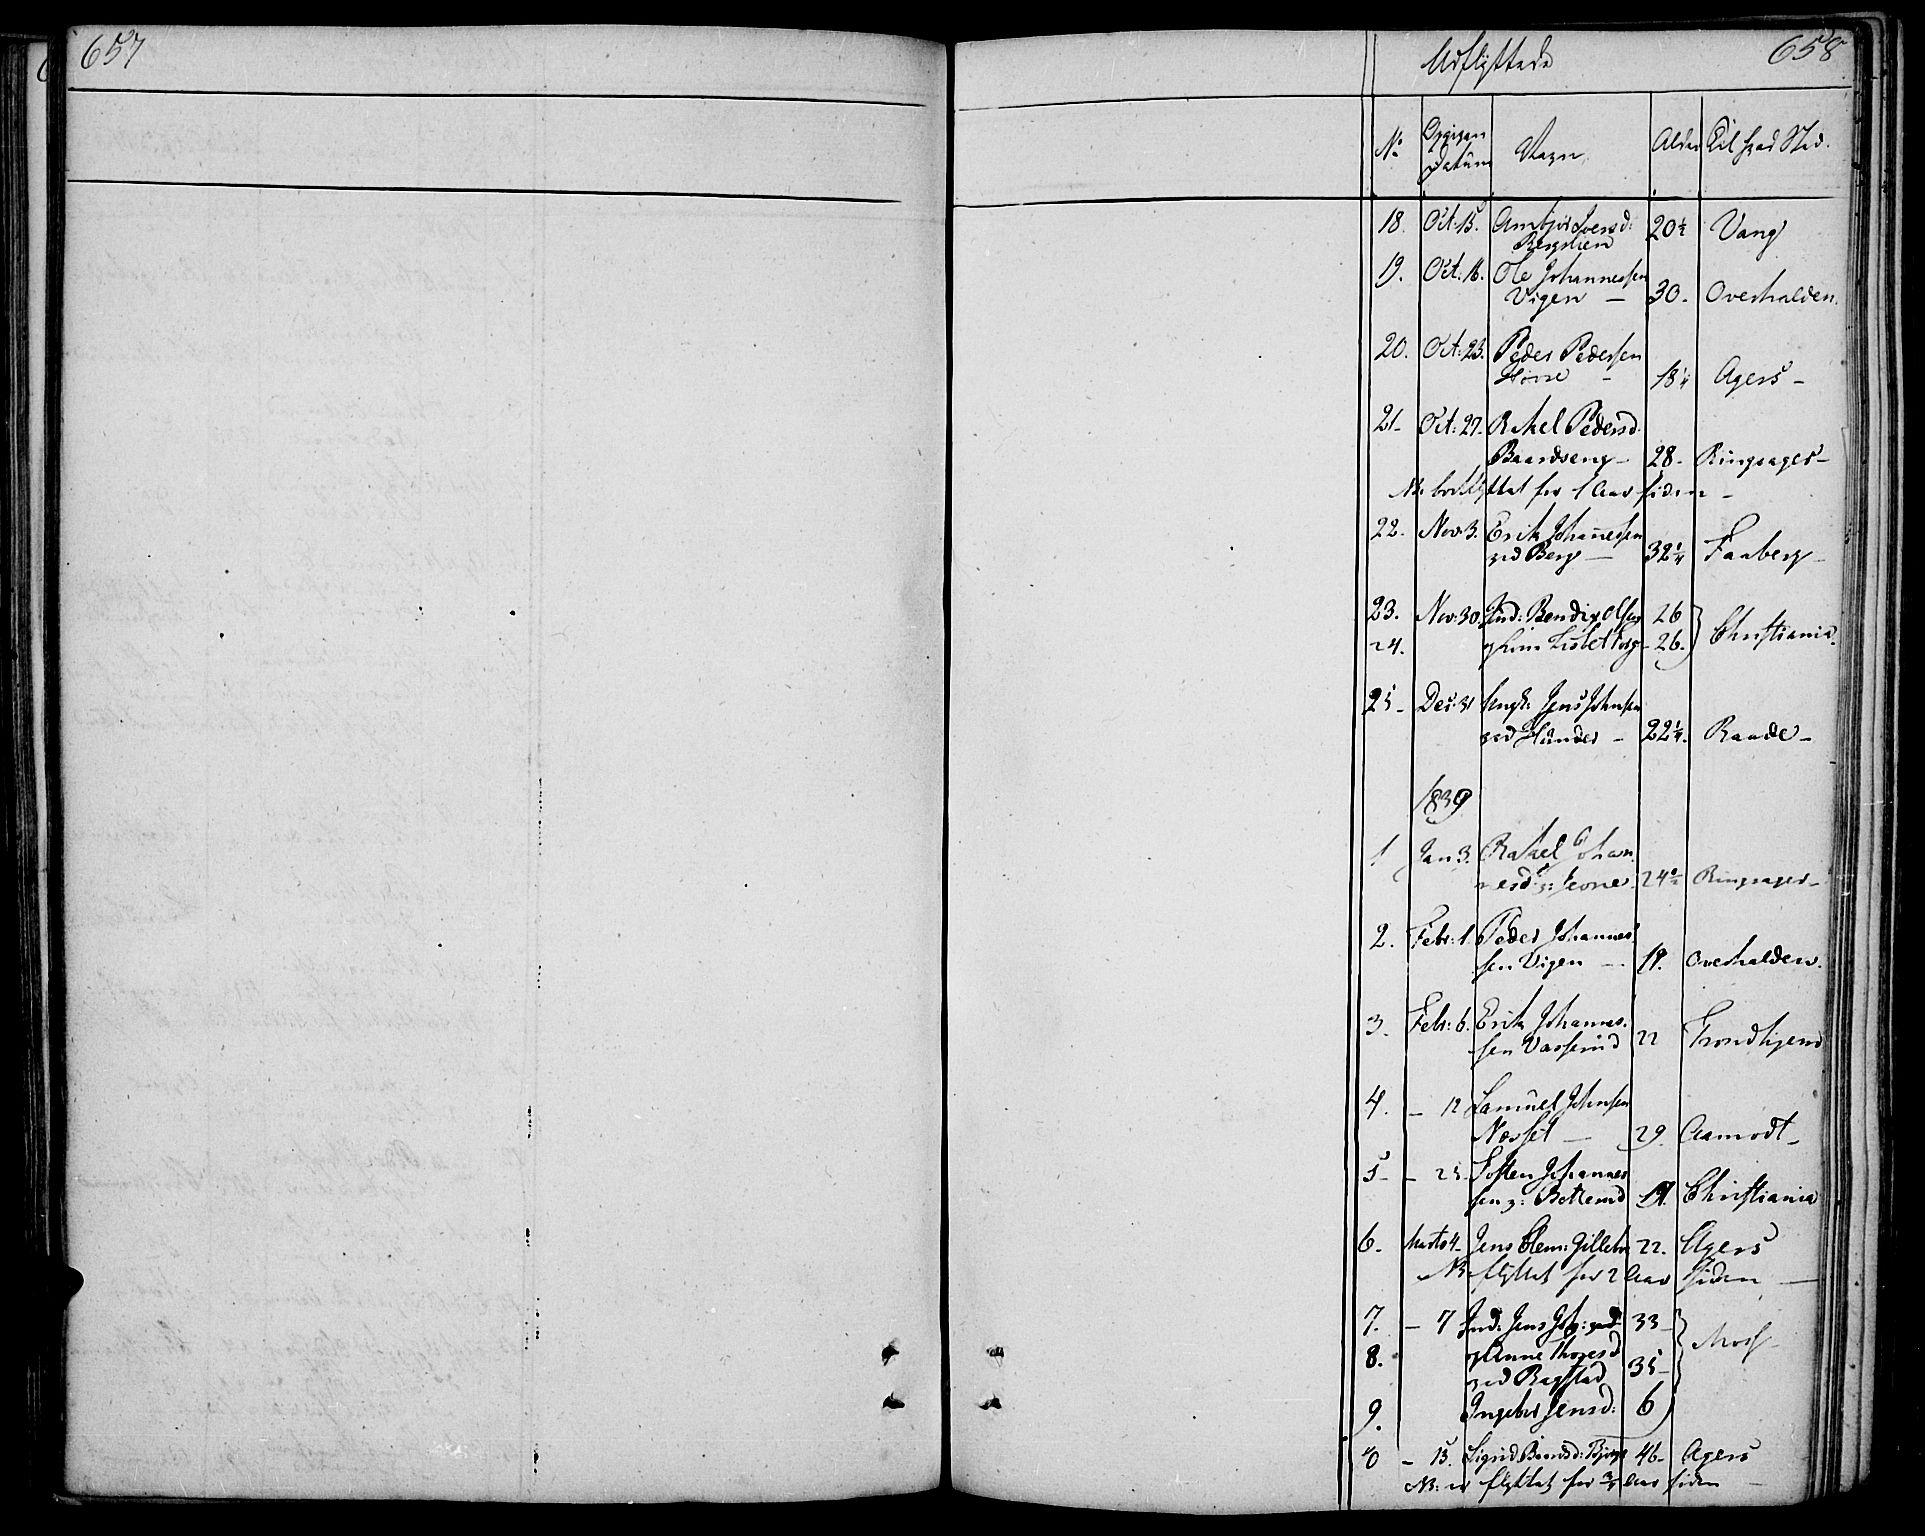 SAH, Øyer prestekontor, Ministerialbok nr. 4, 1824-1841, s. 657-658